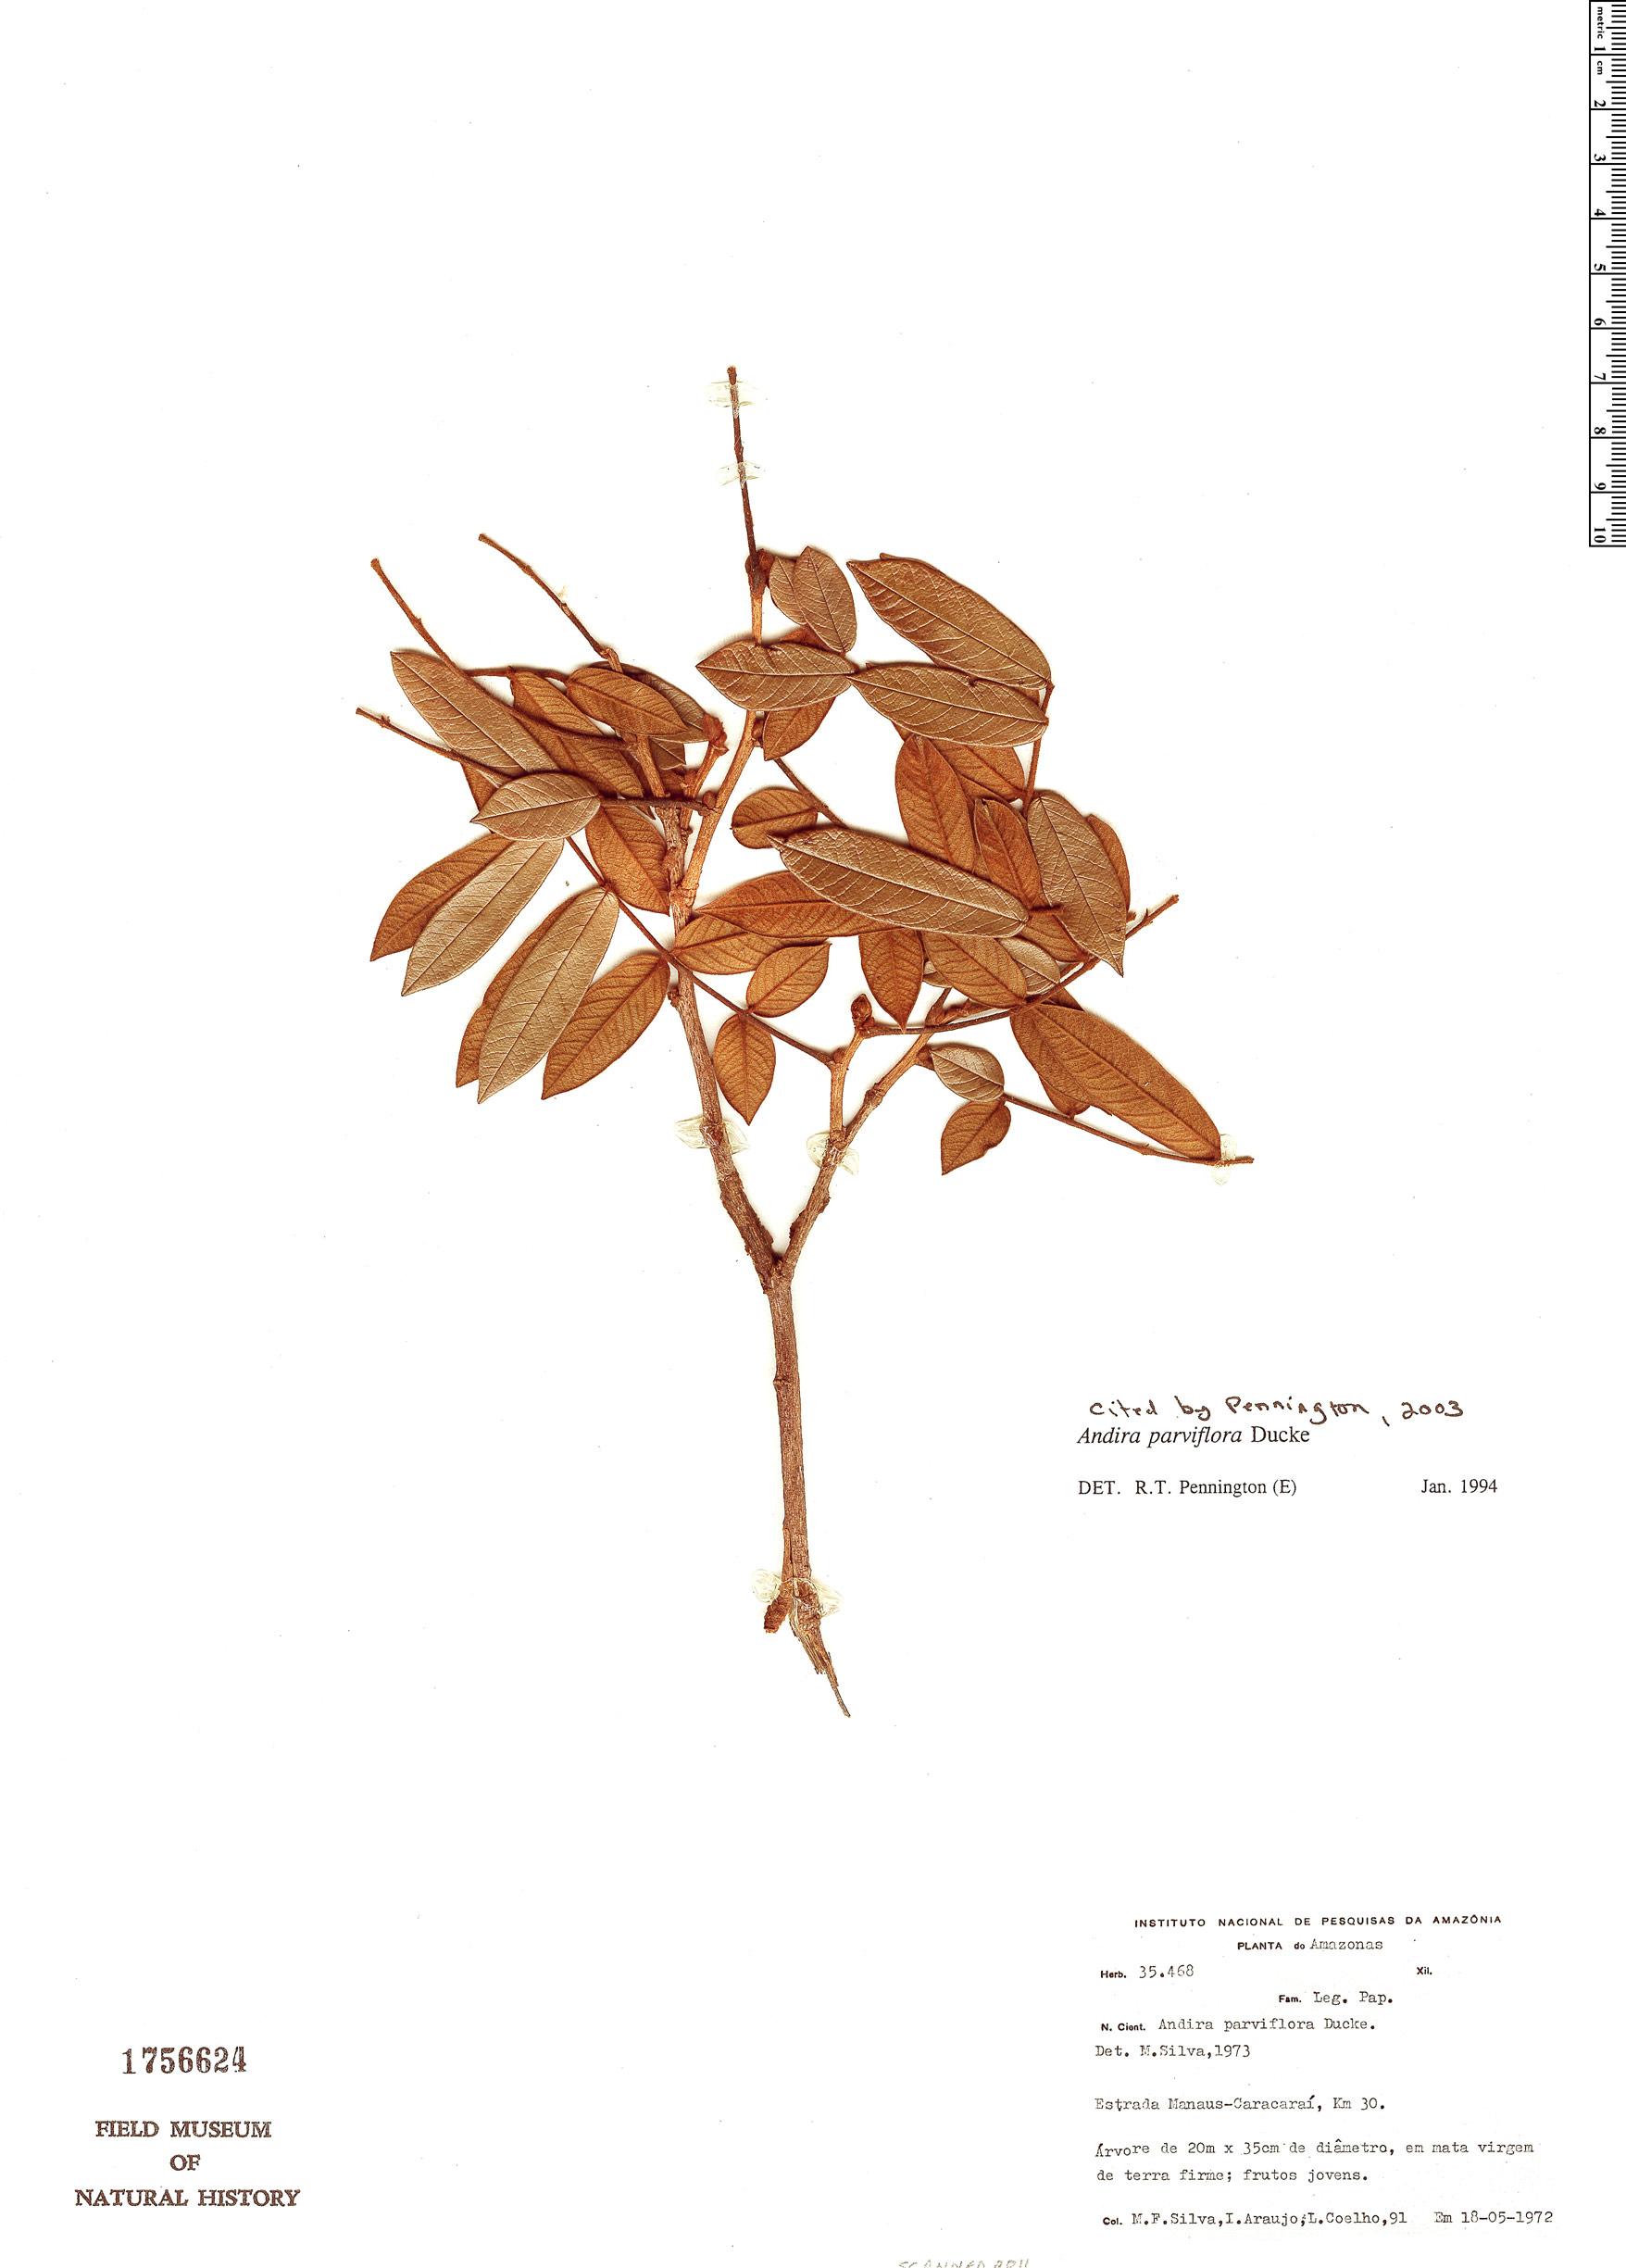 Specimen: Andira parviflora